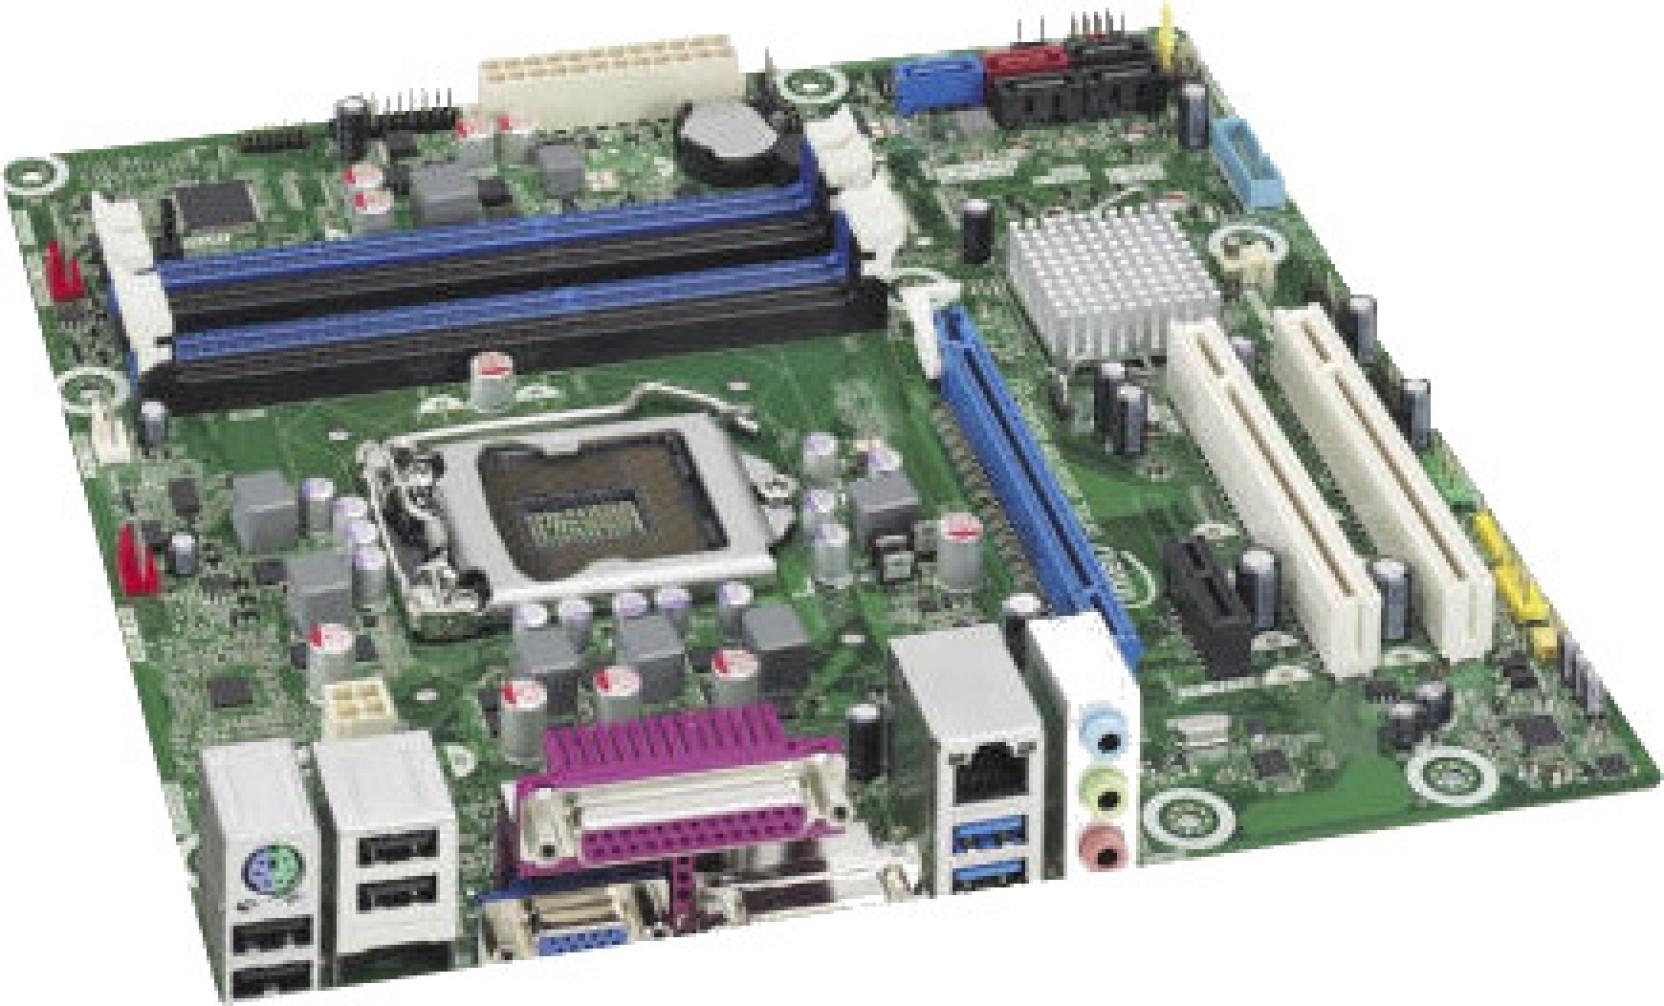 Intel Db75en Motherboard Share